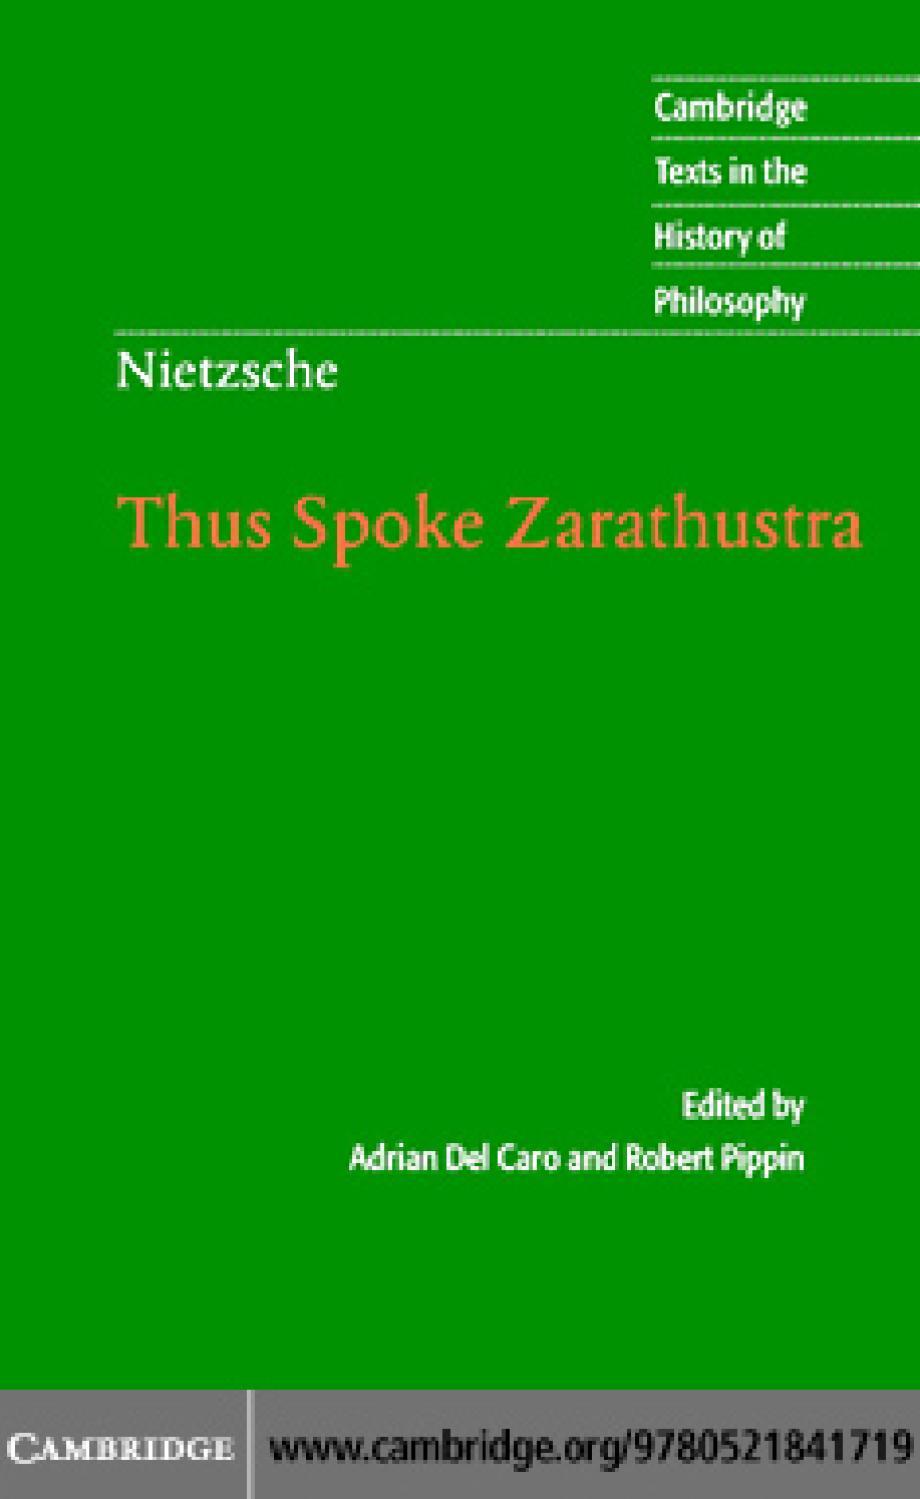 Nietzsche - Thus Spoke Zarathustra (CUP) by naquash v - issuu